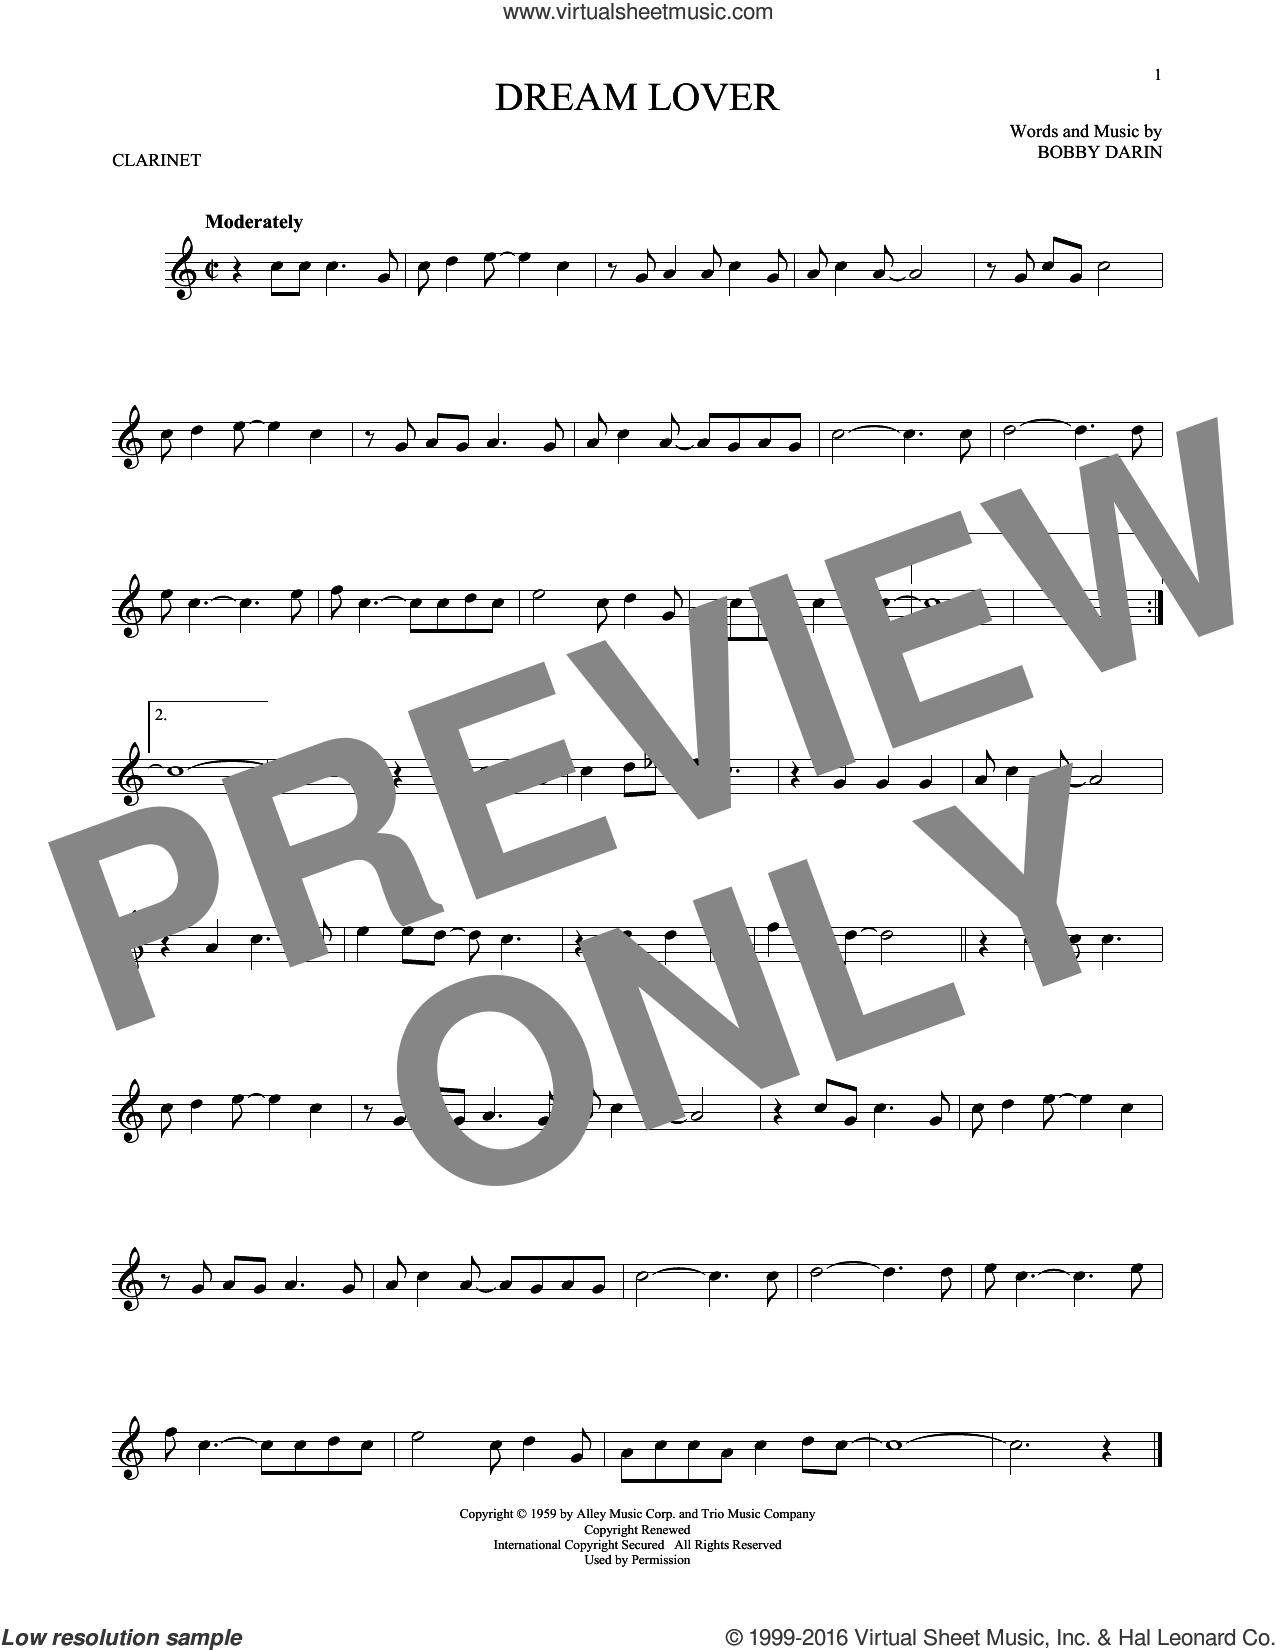 Dream Lover sheet music for clarinet solo by Bobby Darin and Manhattan Transfer, intermediate skill level